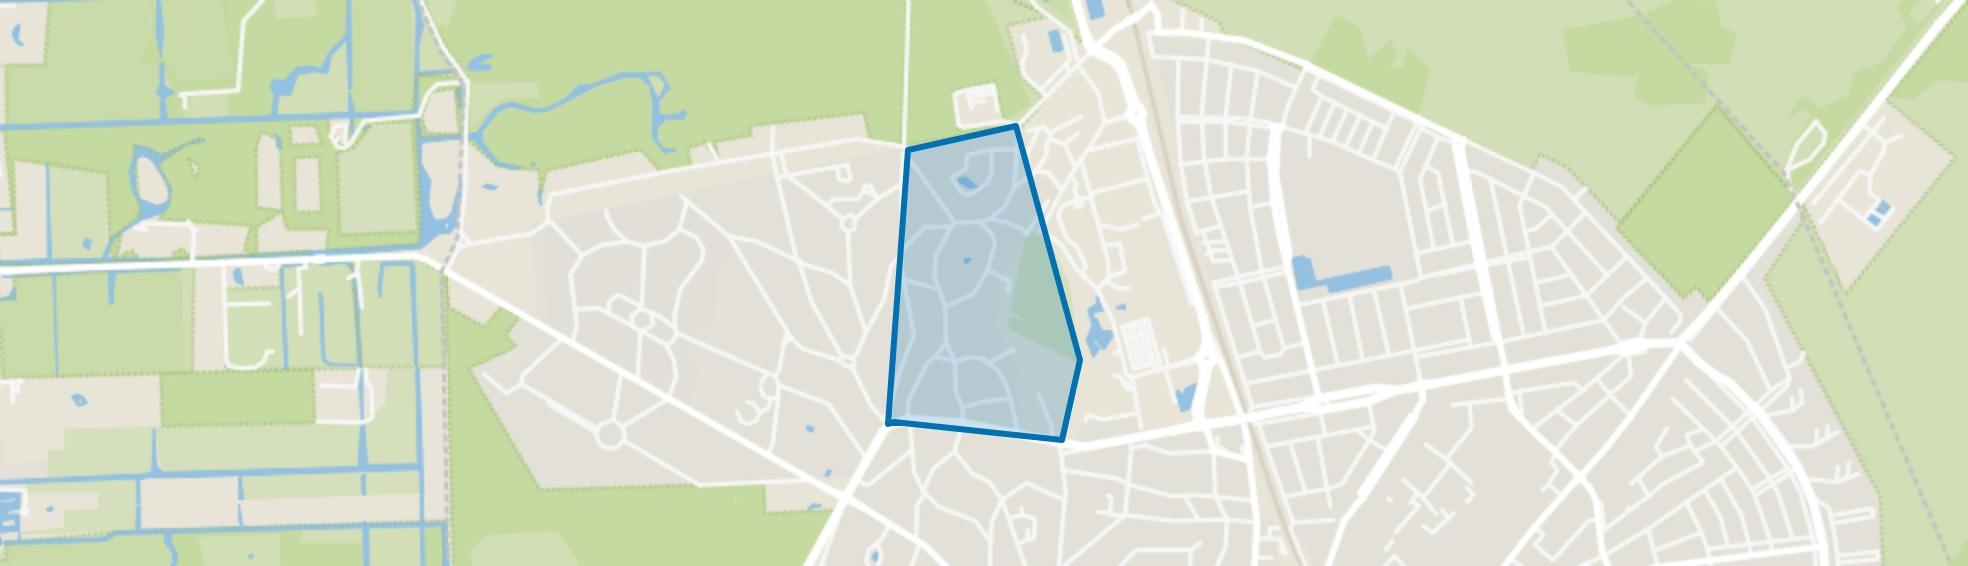 Trompenberg-Noord, Hilversum map